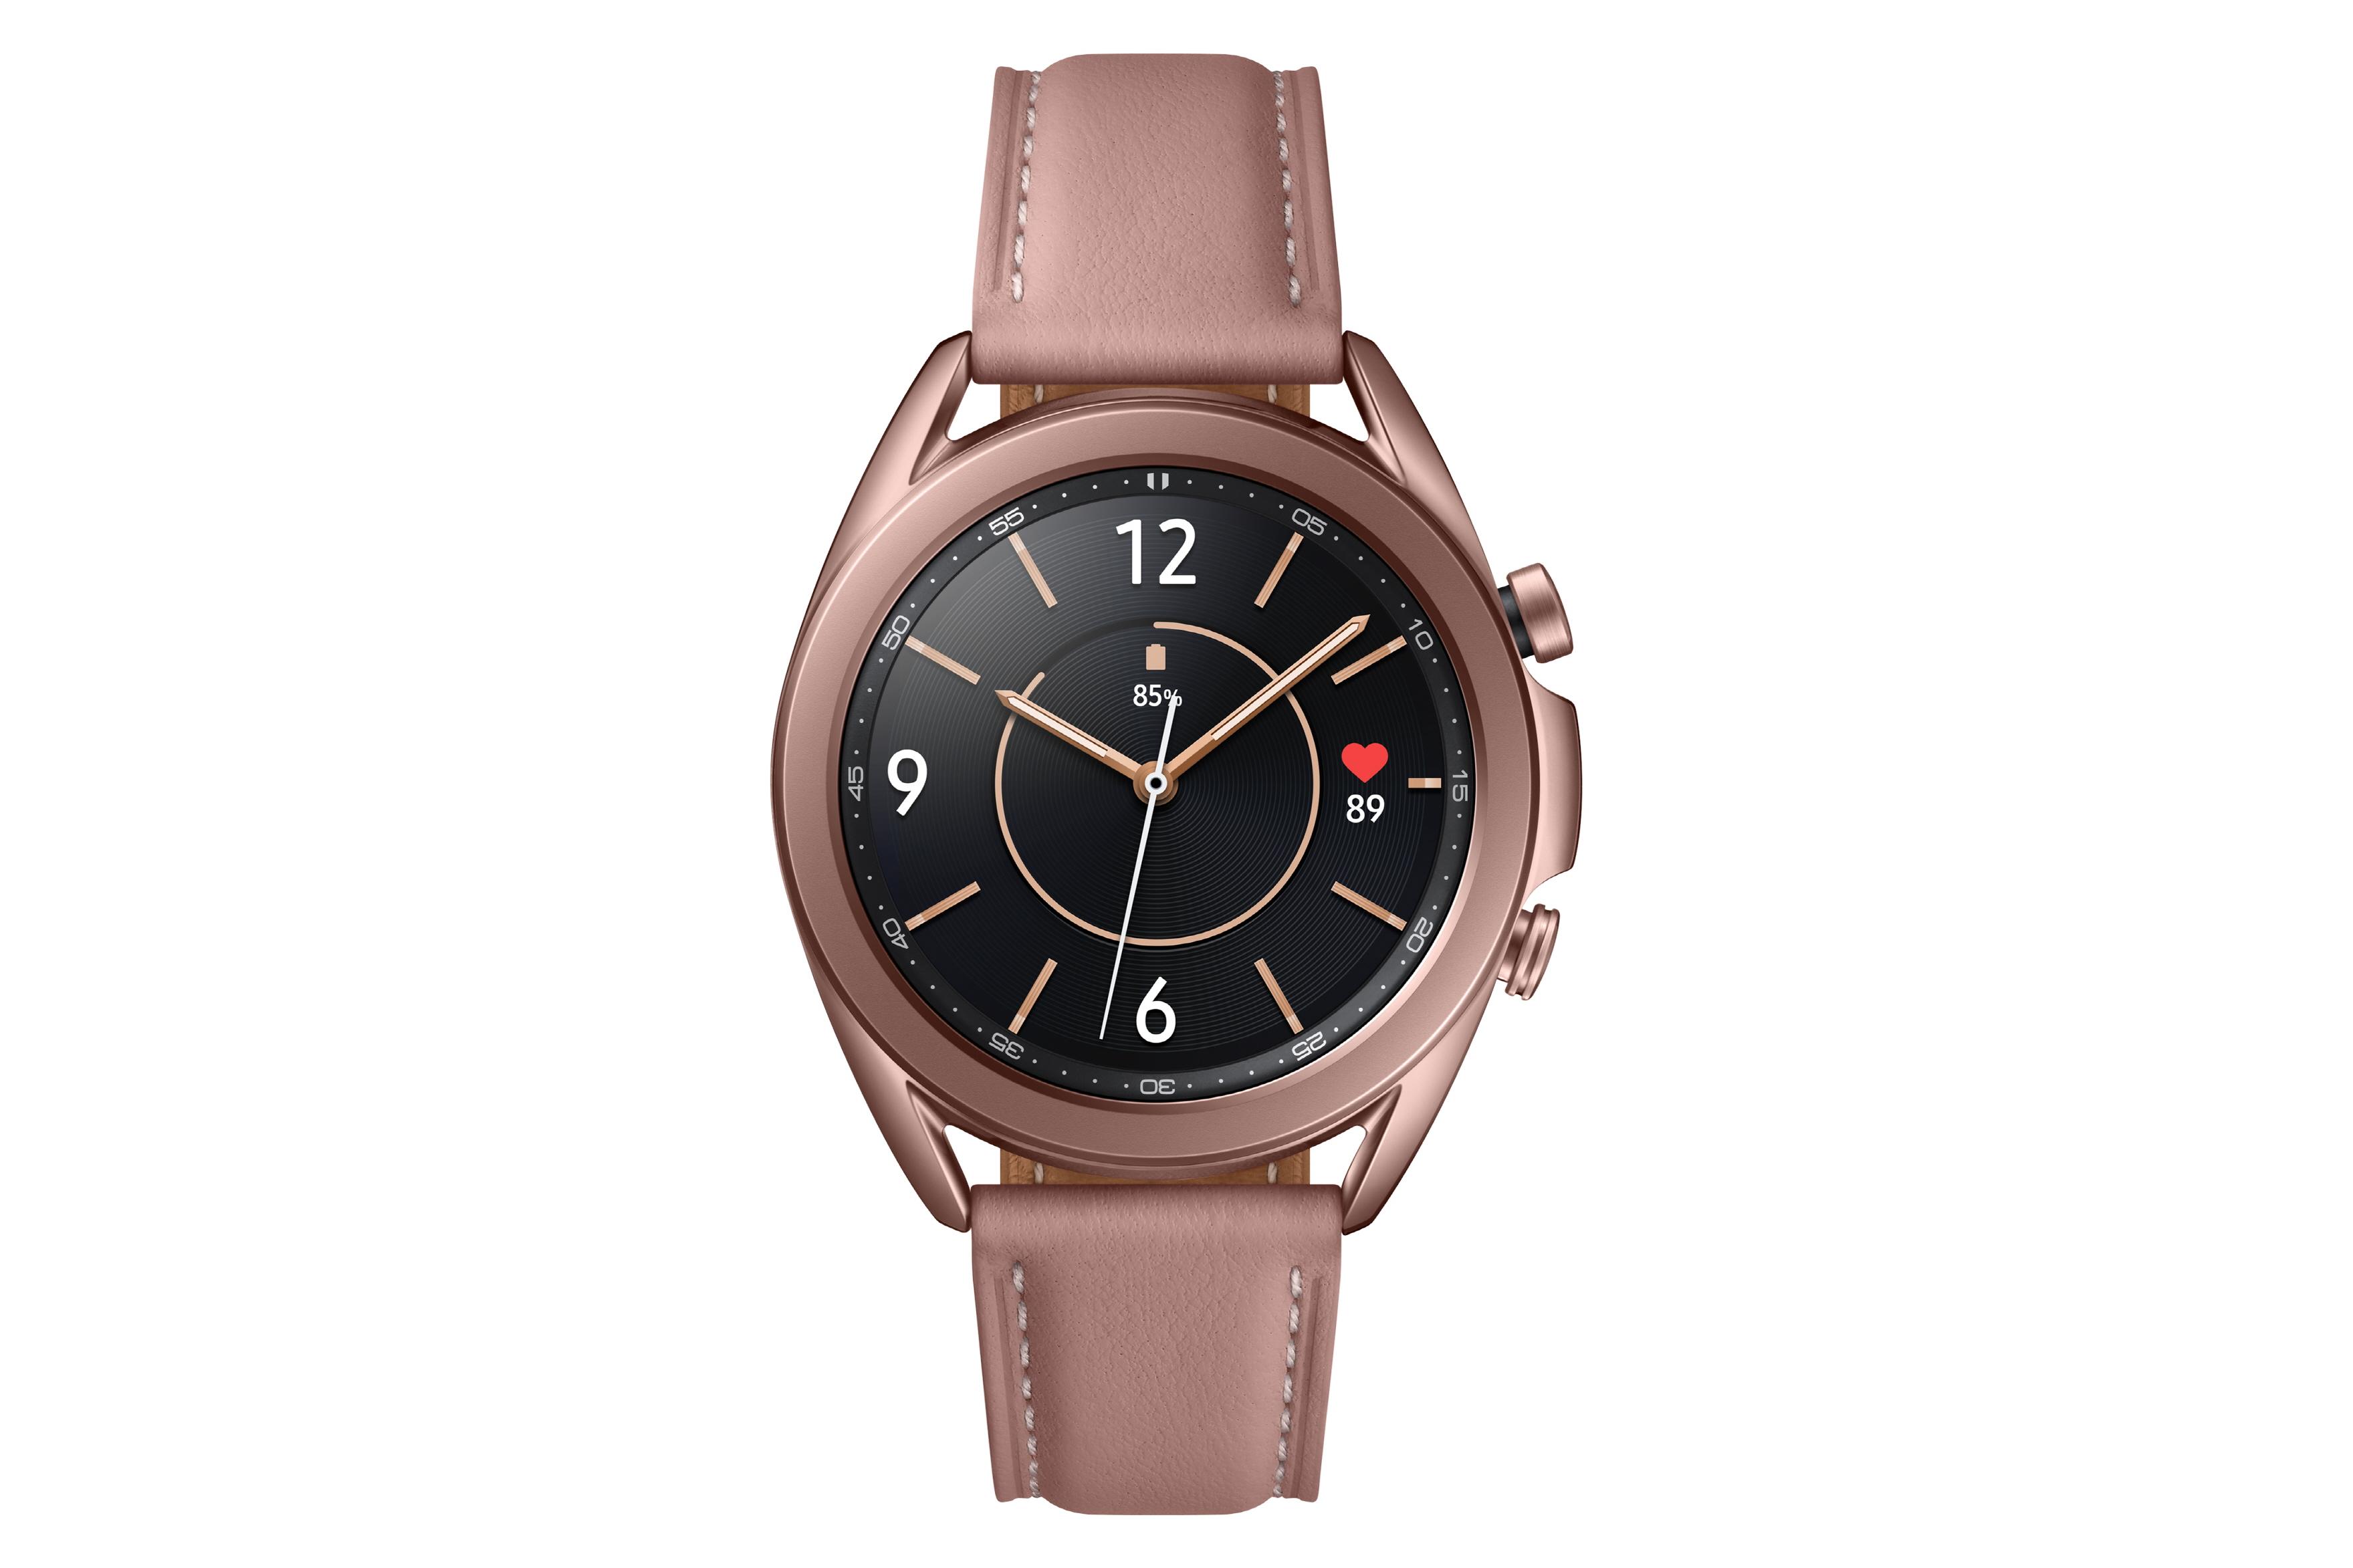 Galaxy Watch 3 image